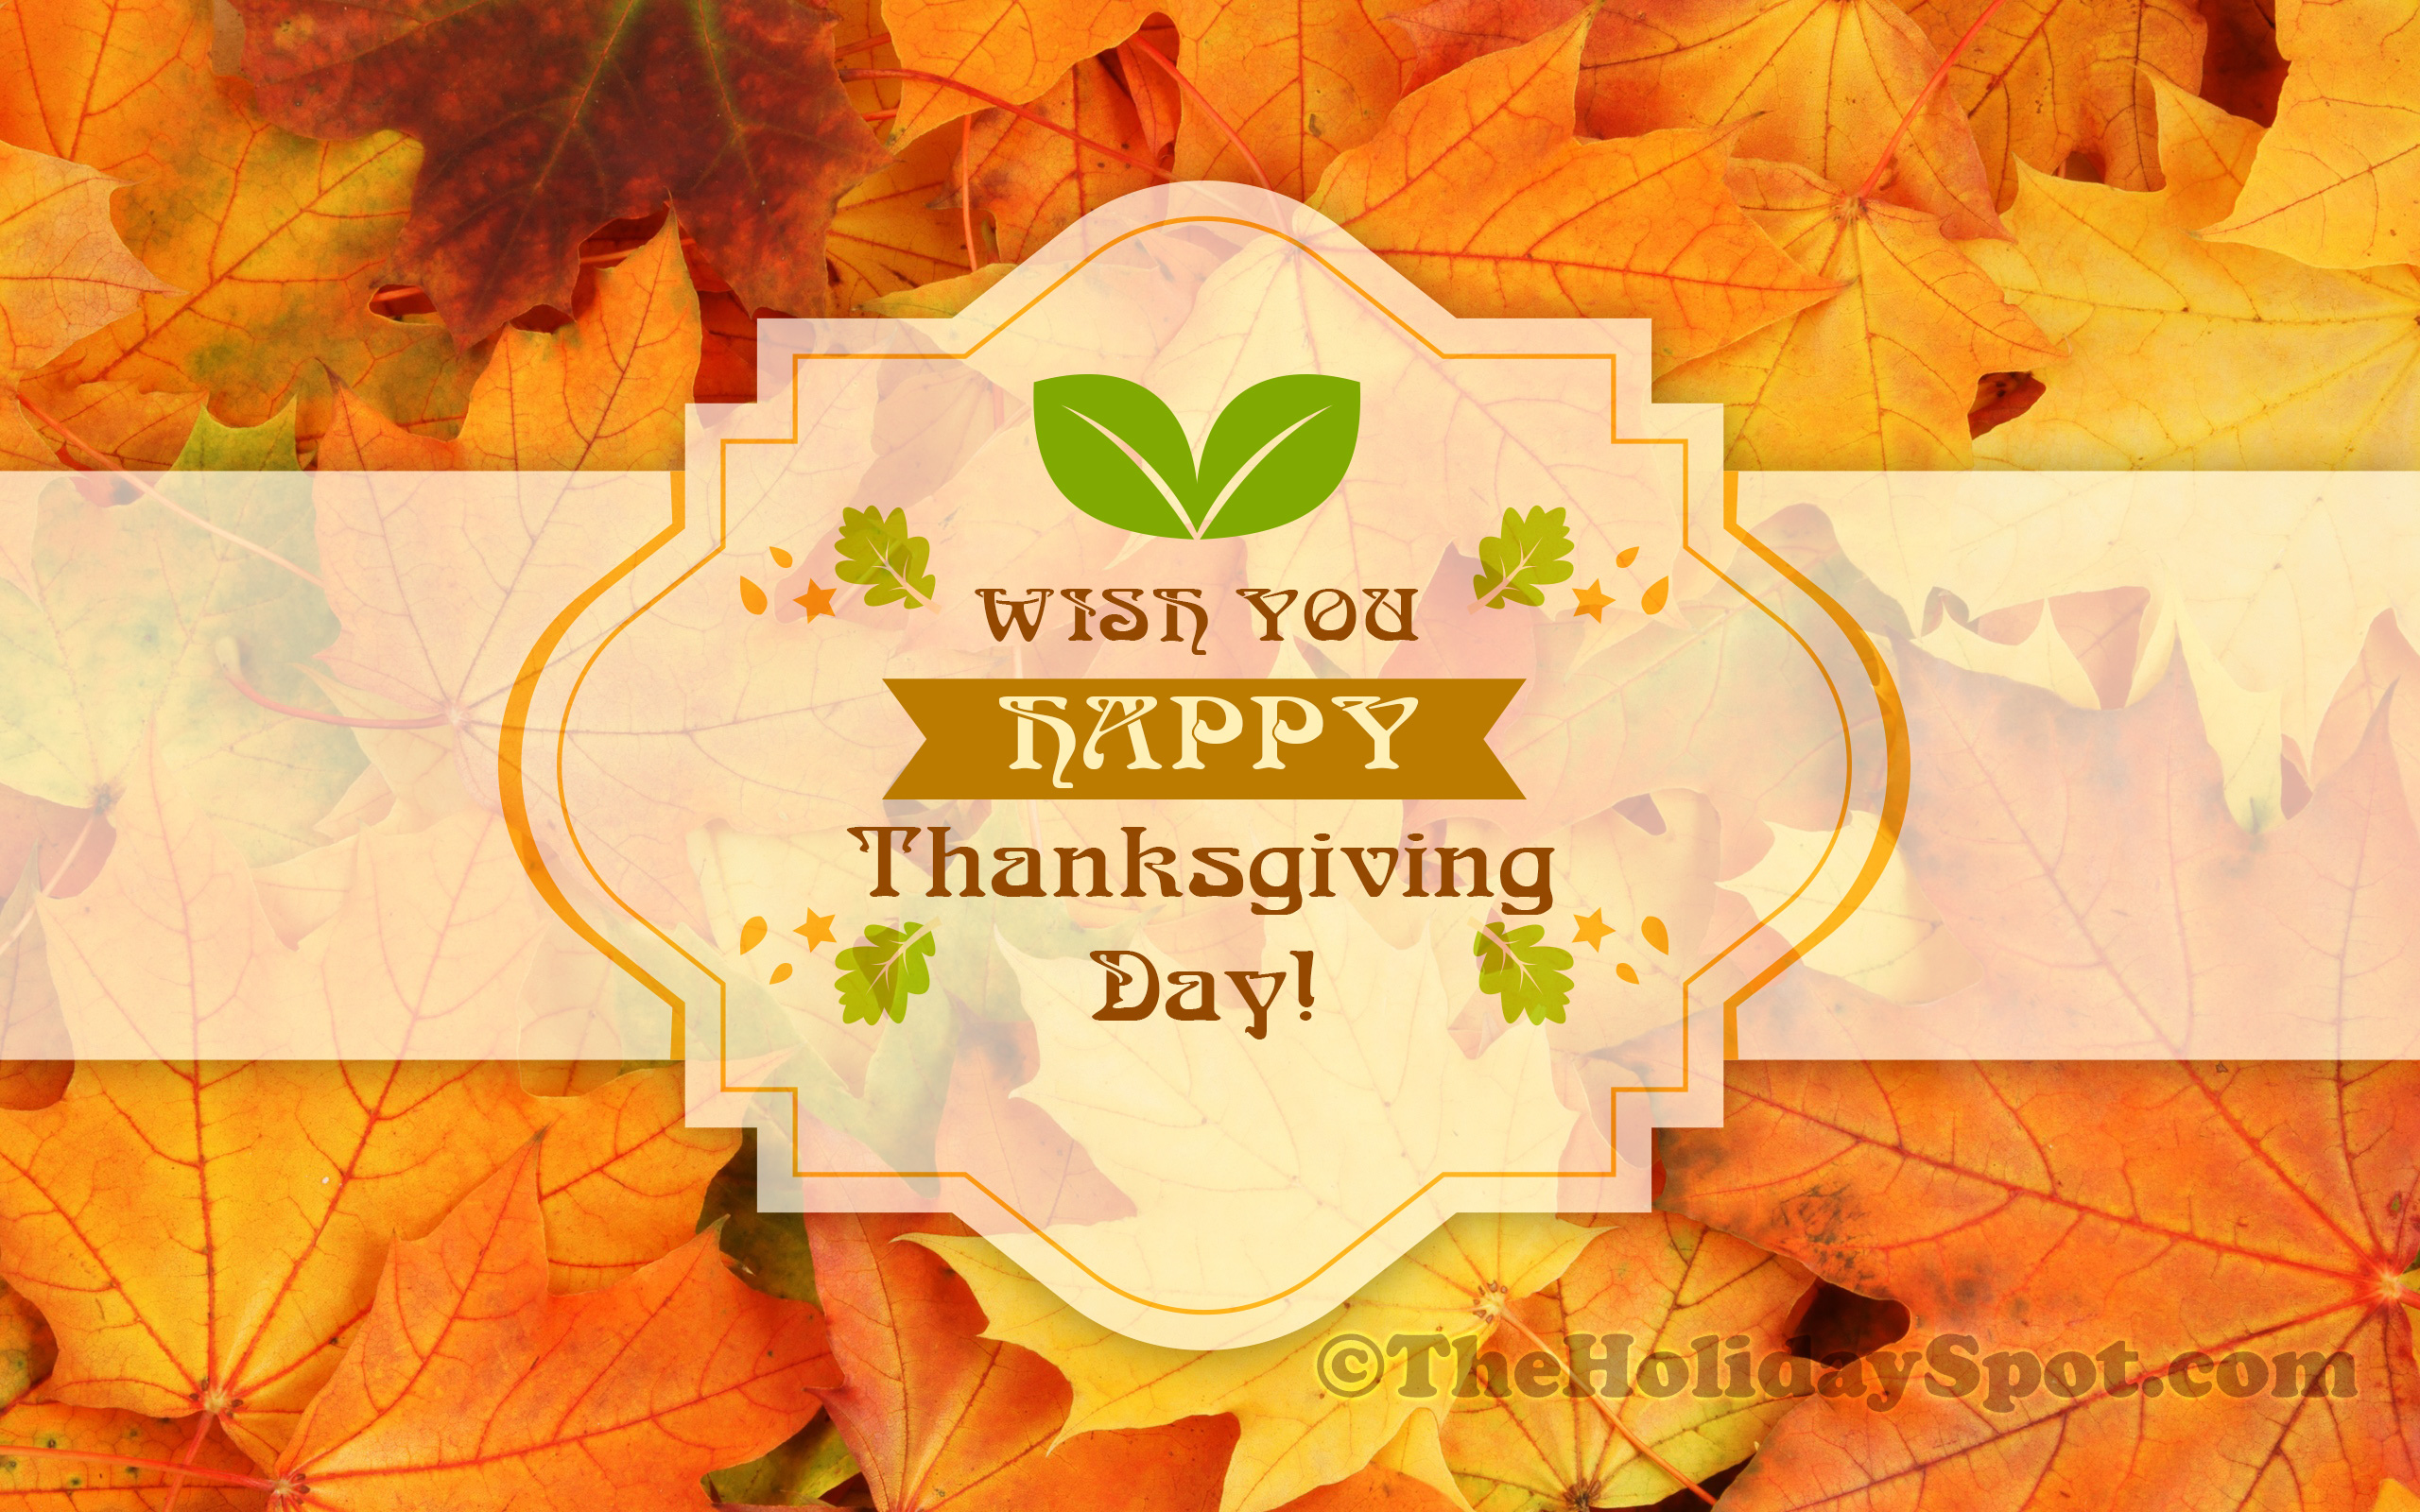 Thanksgiving Wallpapers HD Happy Thanksgiving Wallpaper Desktop 2560x1600